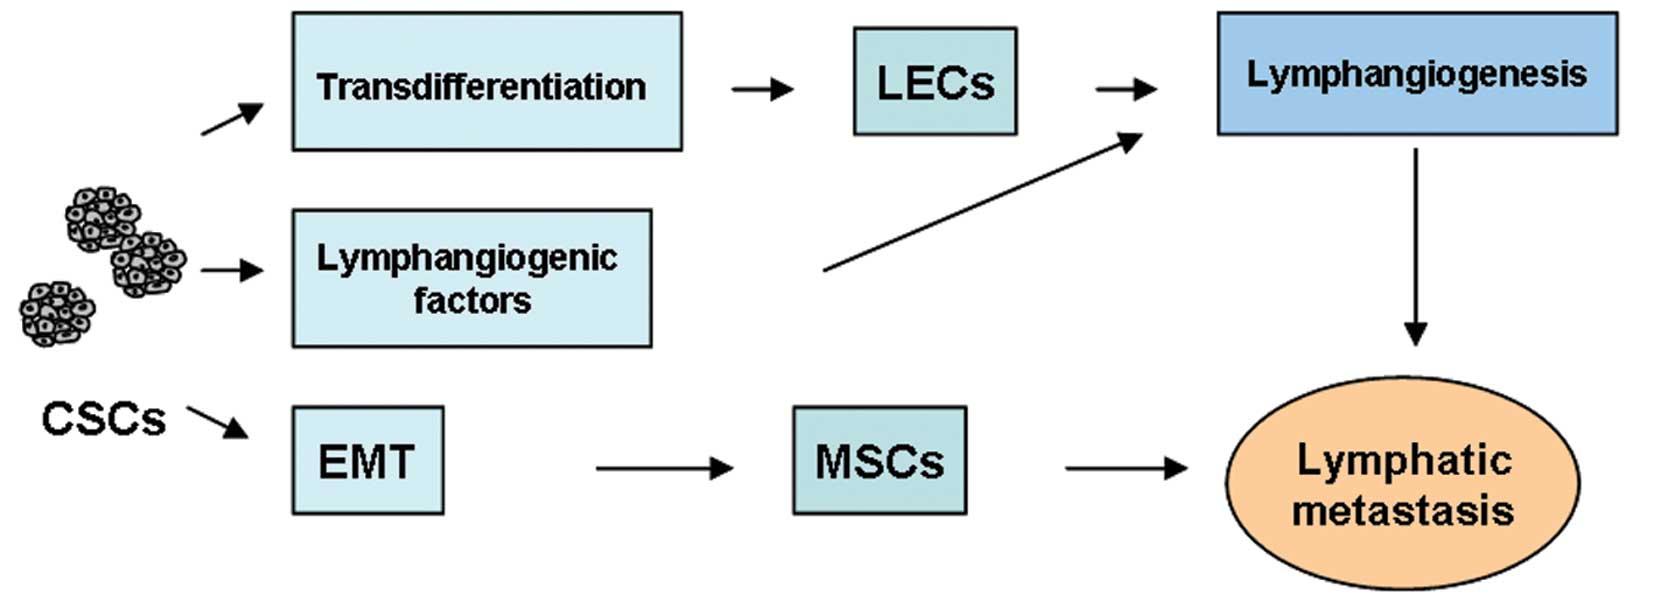 relationship between angiogenesis and metastasis